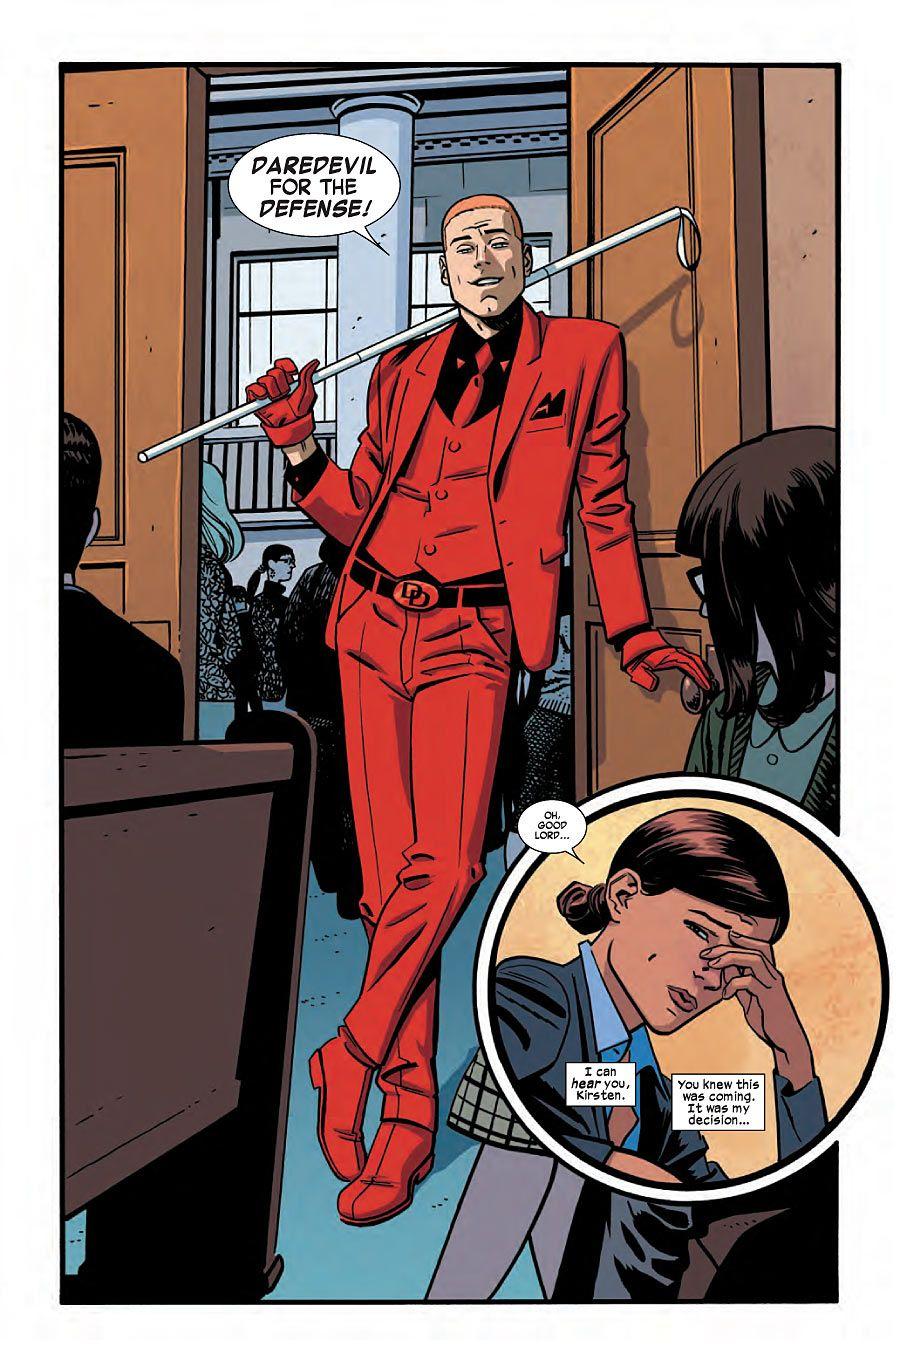 COMICS: 'Matt Murdock' Gets A Strange New Look In First Look At DAREDEVIL  #14